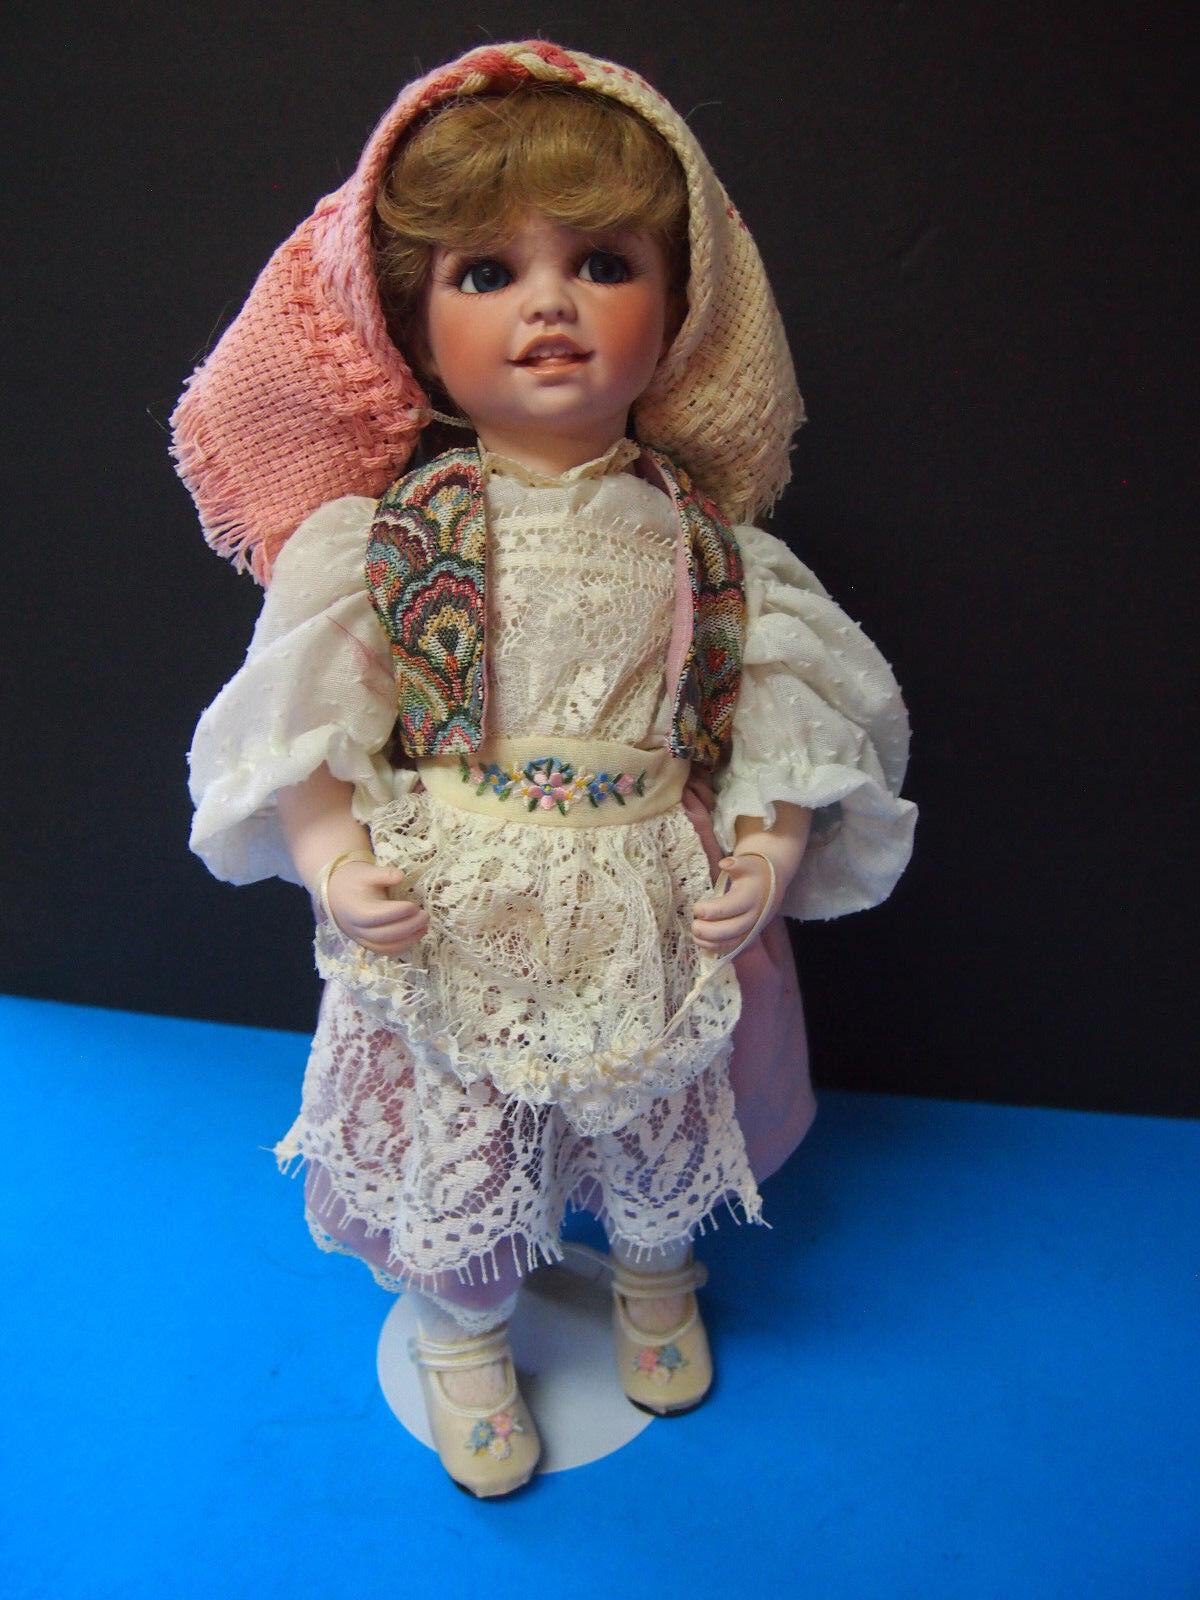 MITZI  International-Sweden- Dolls by Jerri McCloud 16  RETIrot VINTAGE DOLL